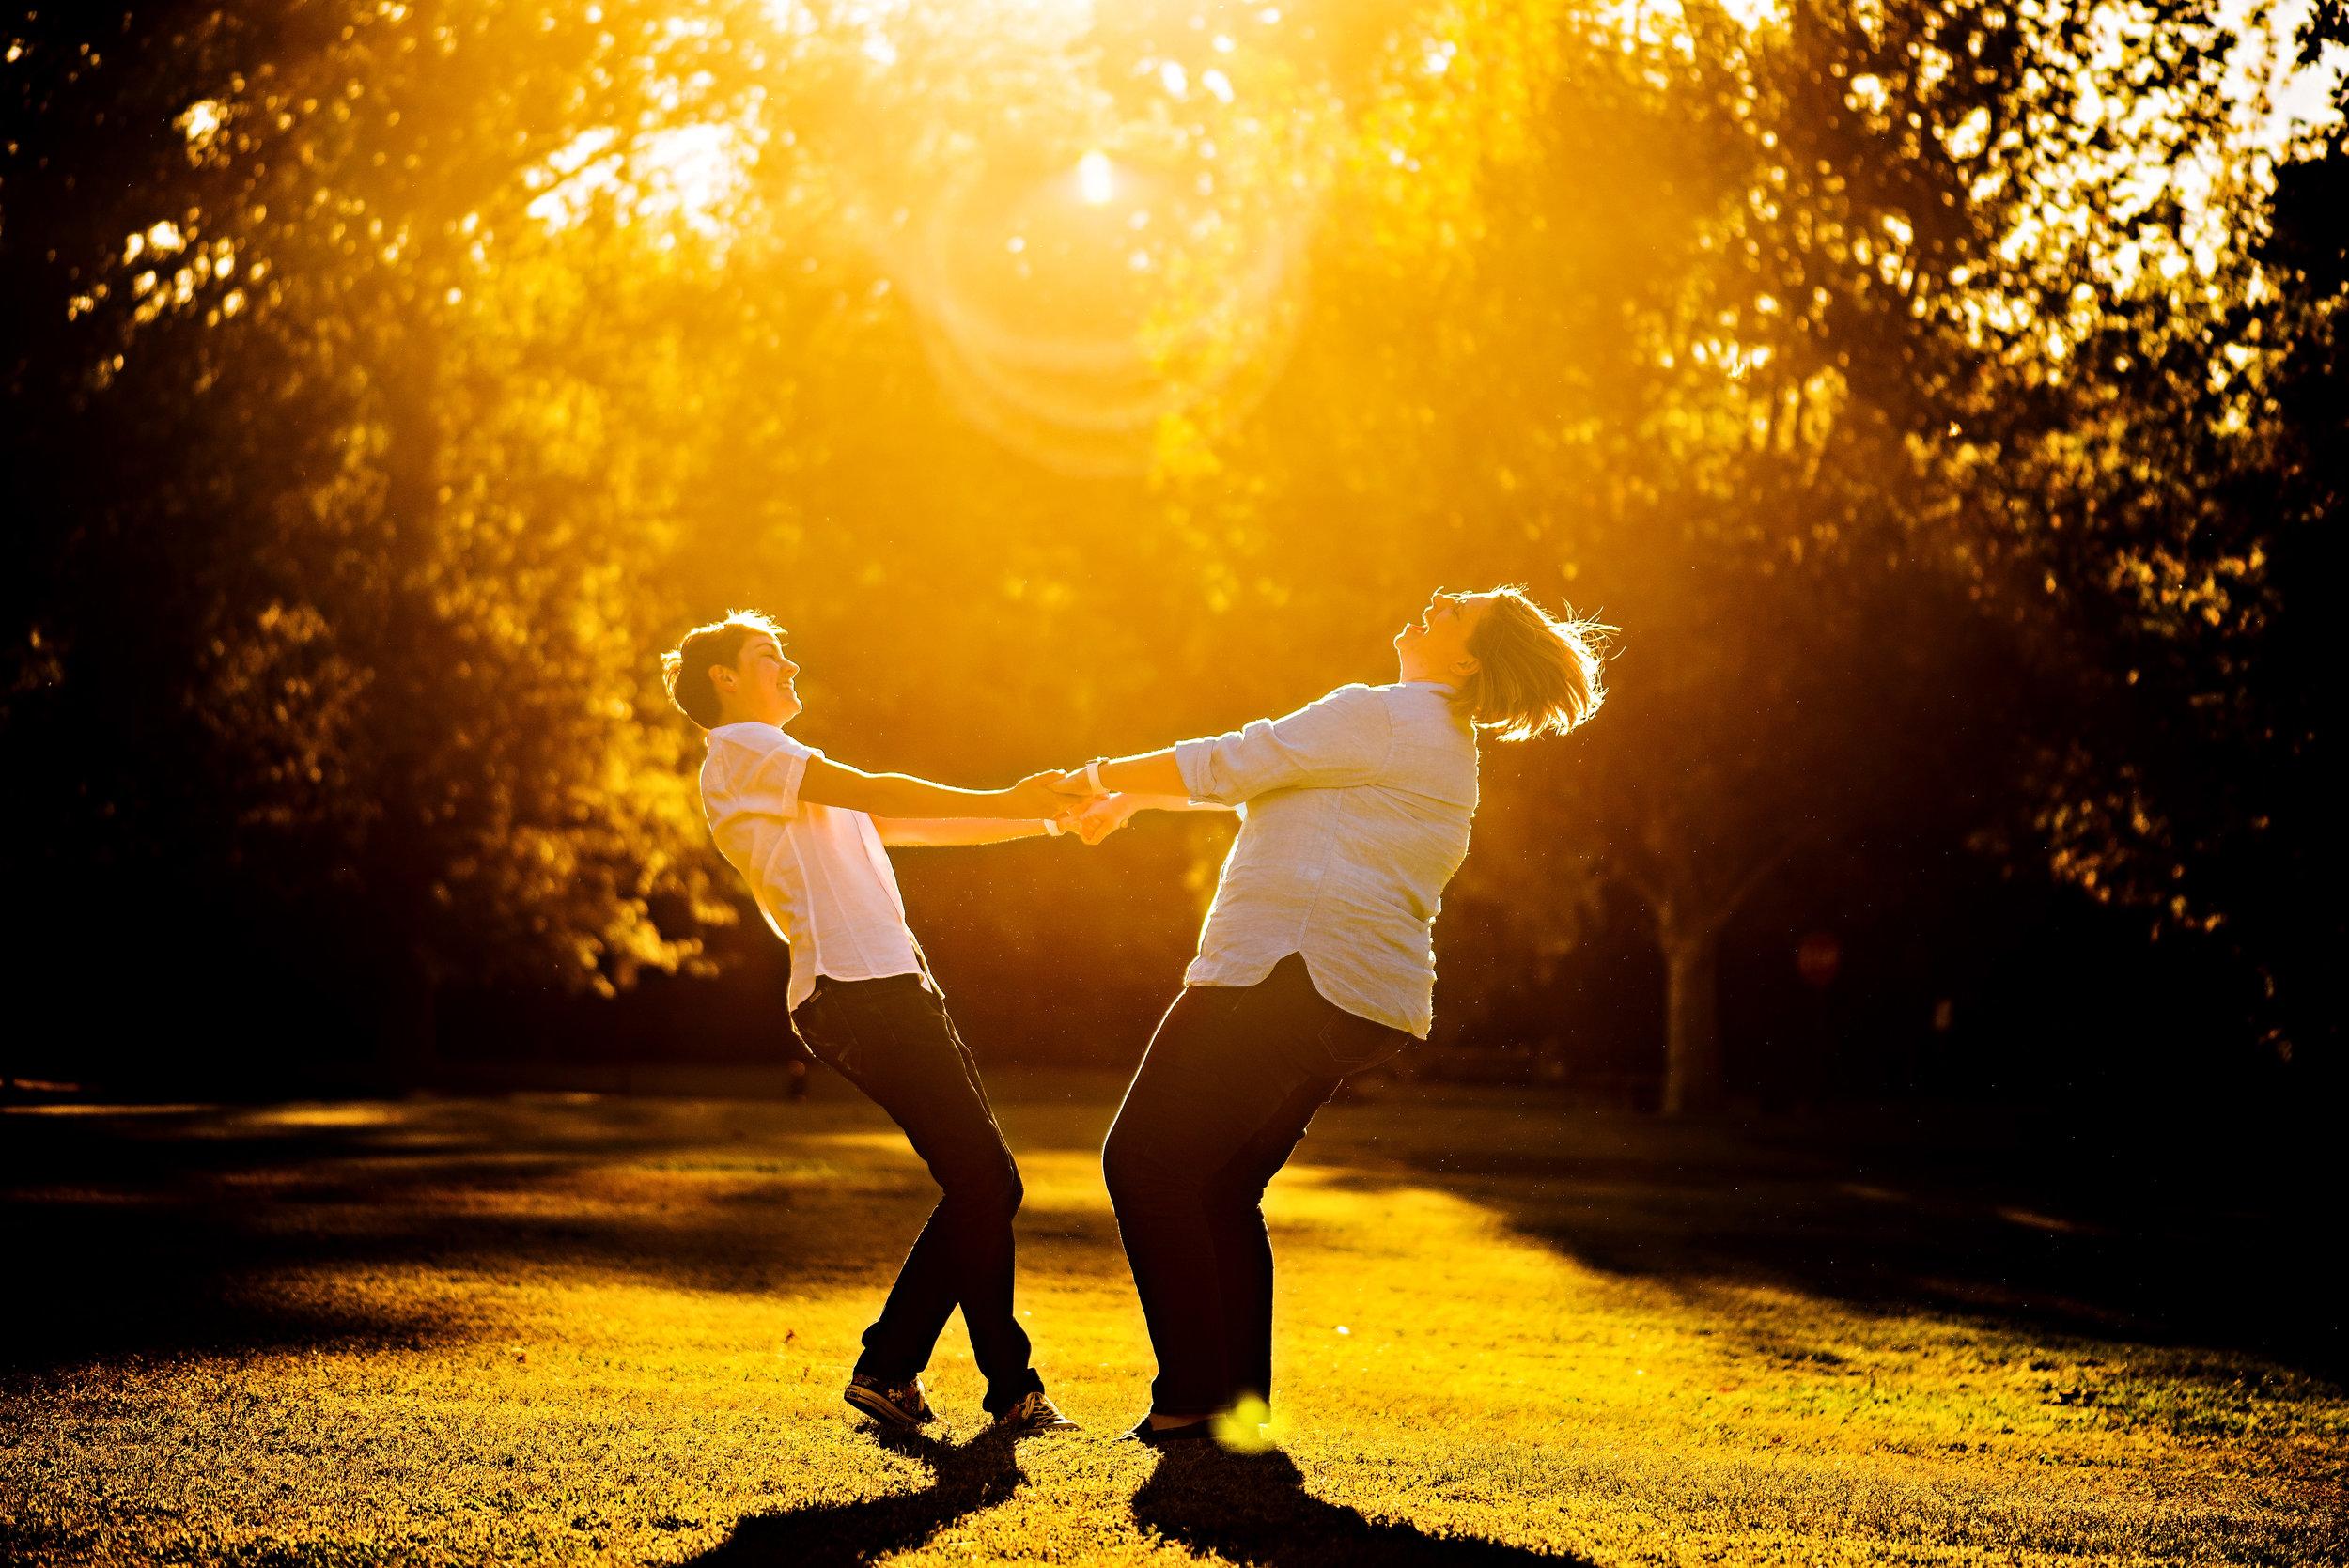 emily-cheryl-026-same-sex-engagement-sacramento-photographer-katherine-nicole-photography.JPG